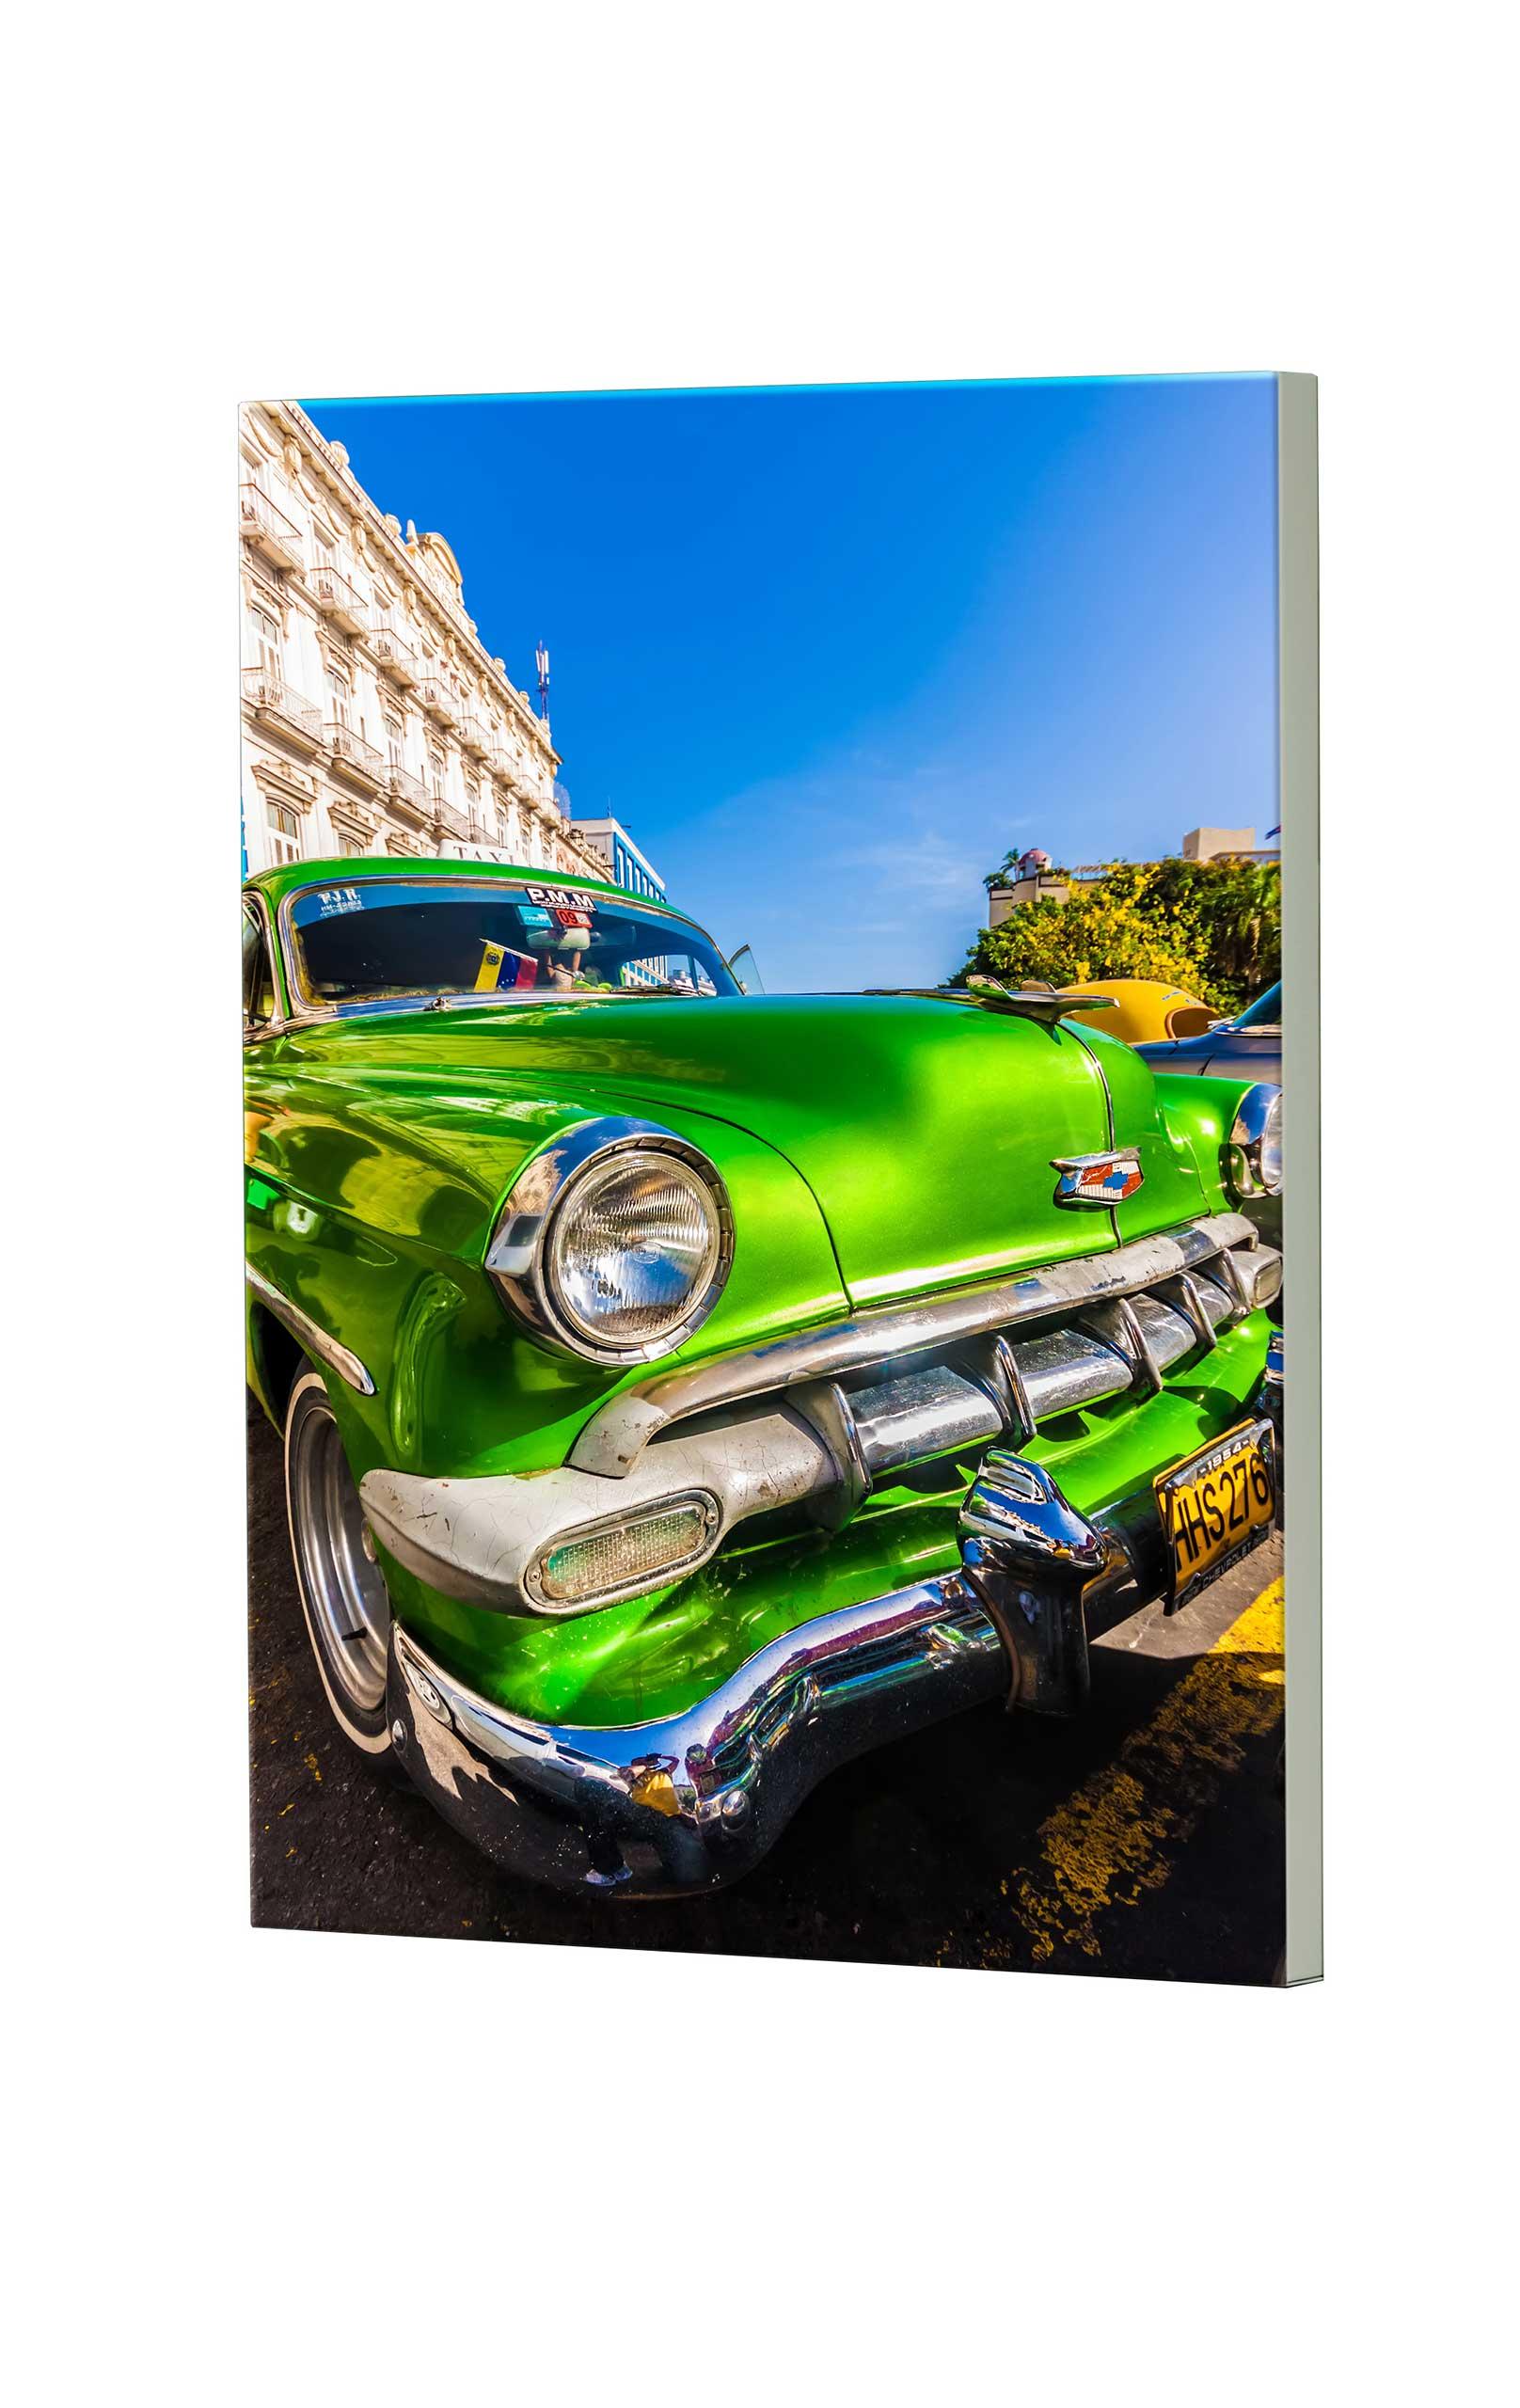 Magnettafel NOTIZ 60x80cm Motiv Classic Car MDH134 Motiv-Pinnwand